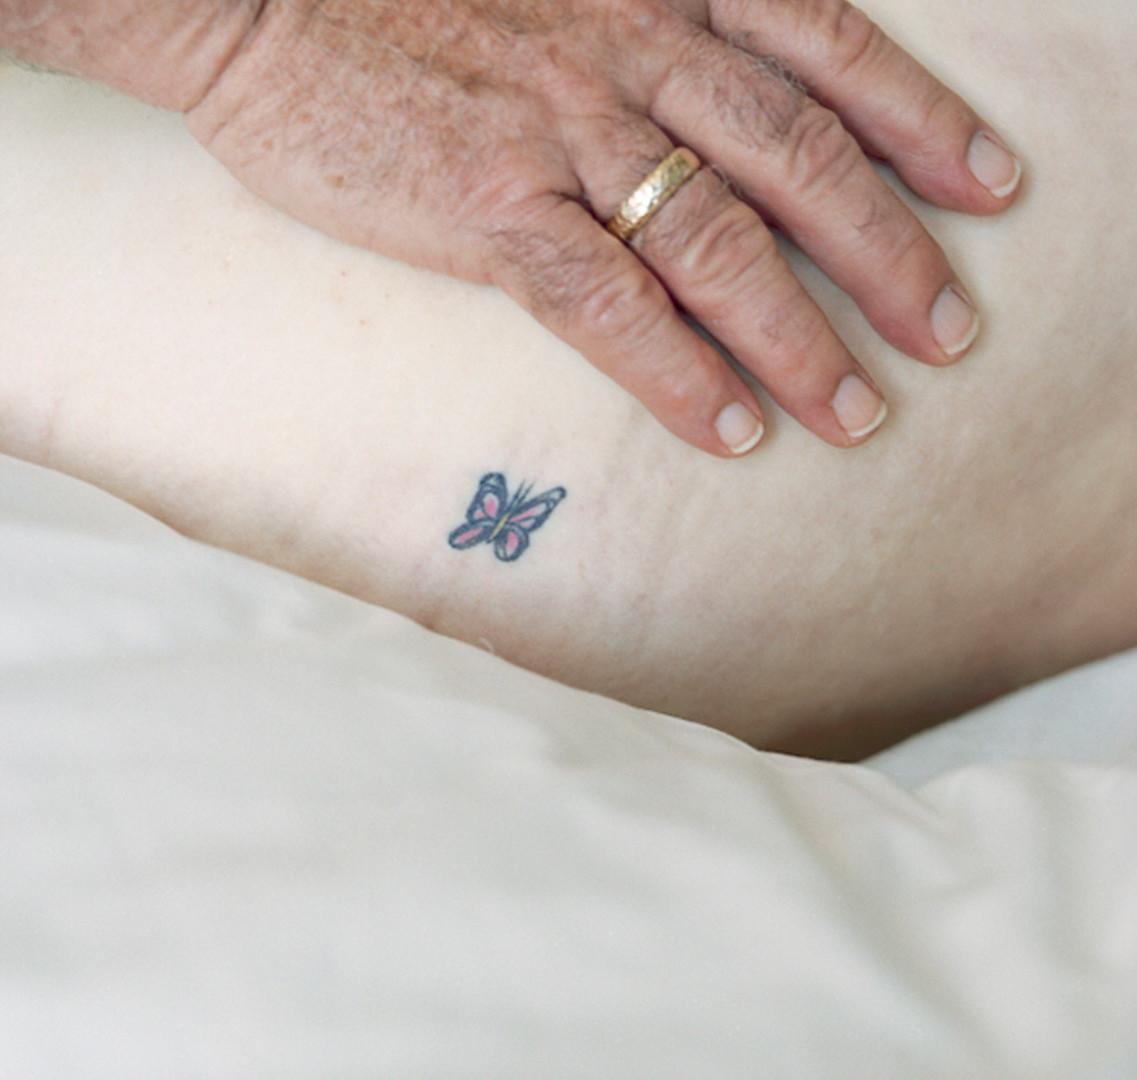 Jocelyn Lee, Untitled (Bob's hand on Mom's tattoo), 2208